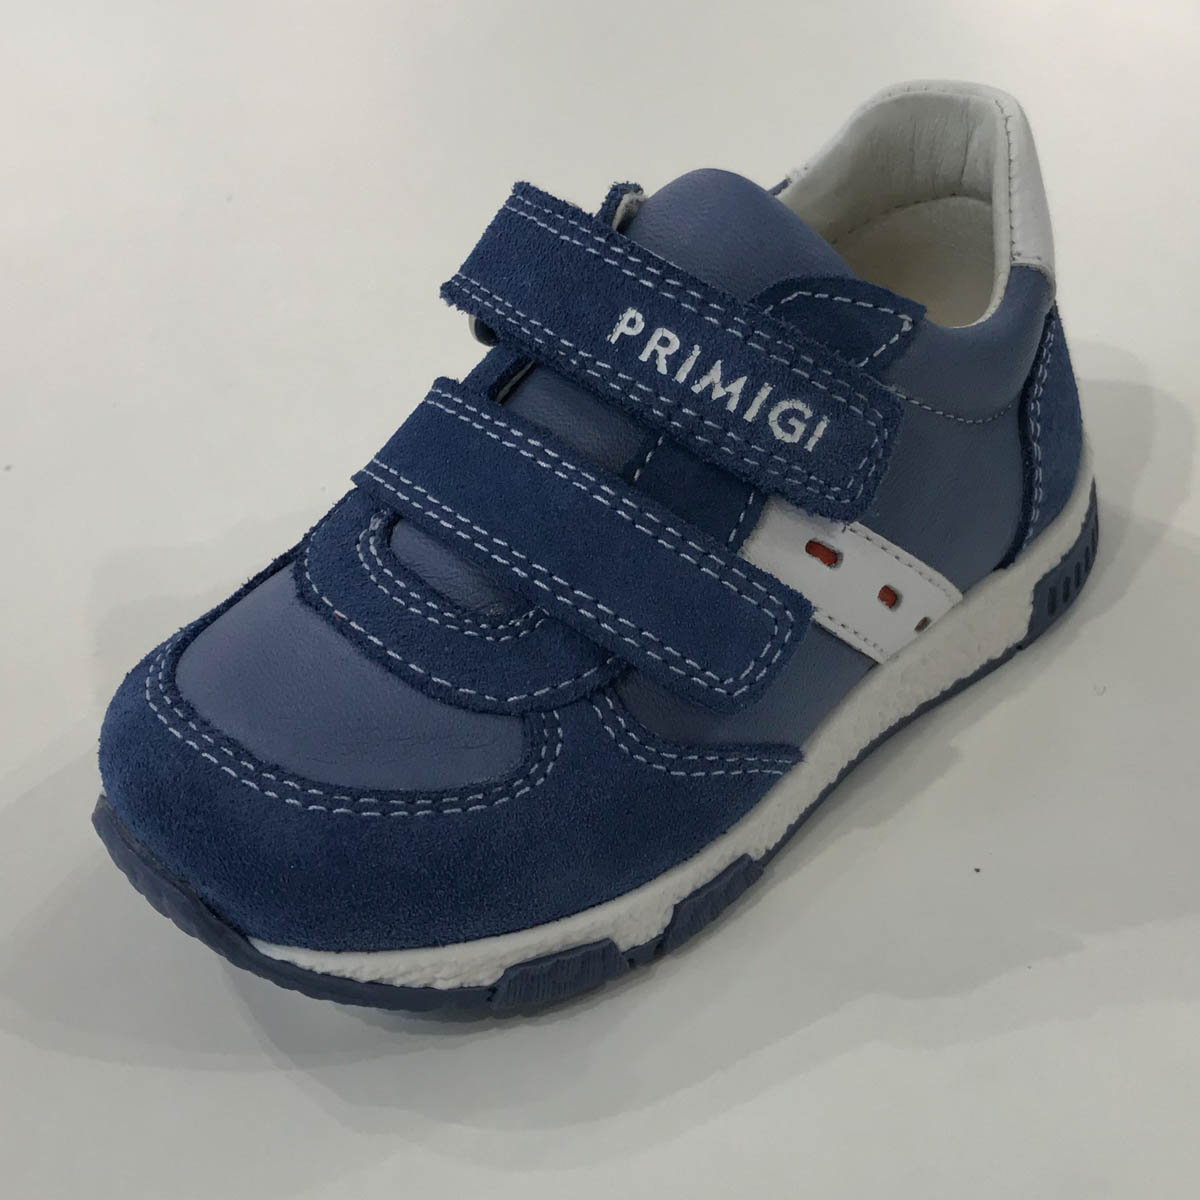 39c264ef767b Primigi First Shoes - Navy - 3413944/70 PLAY SPORT